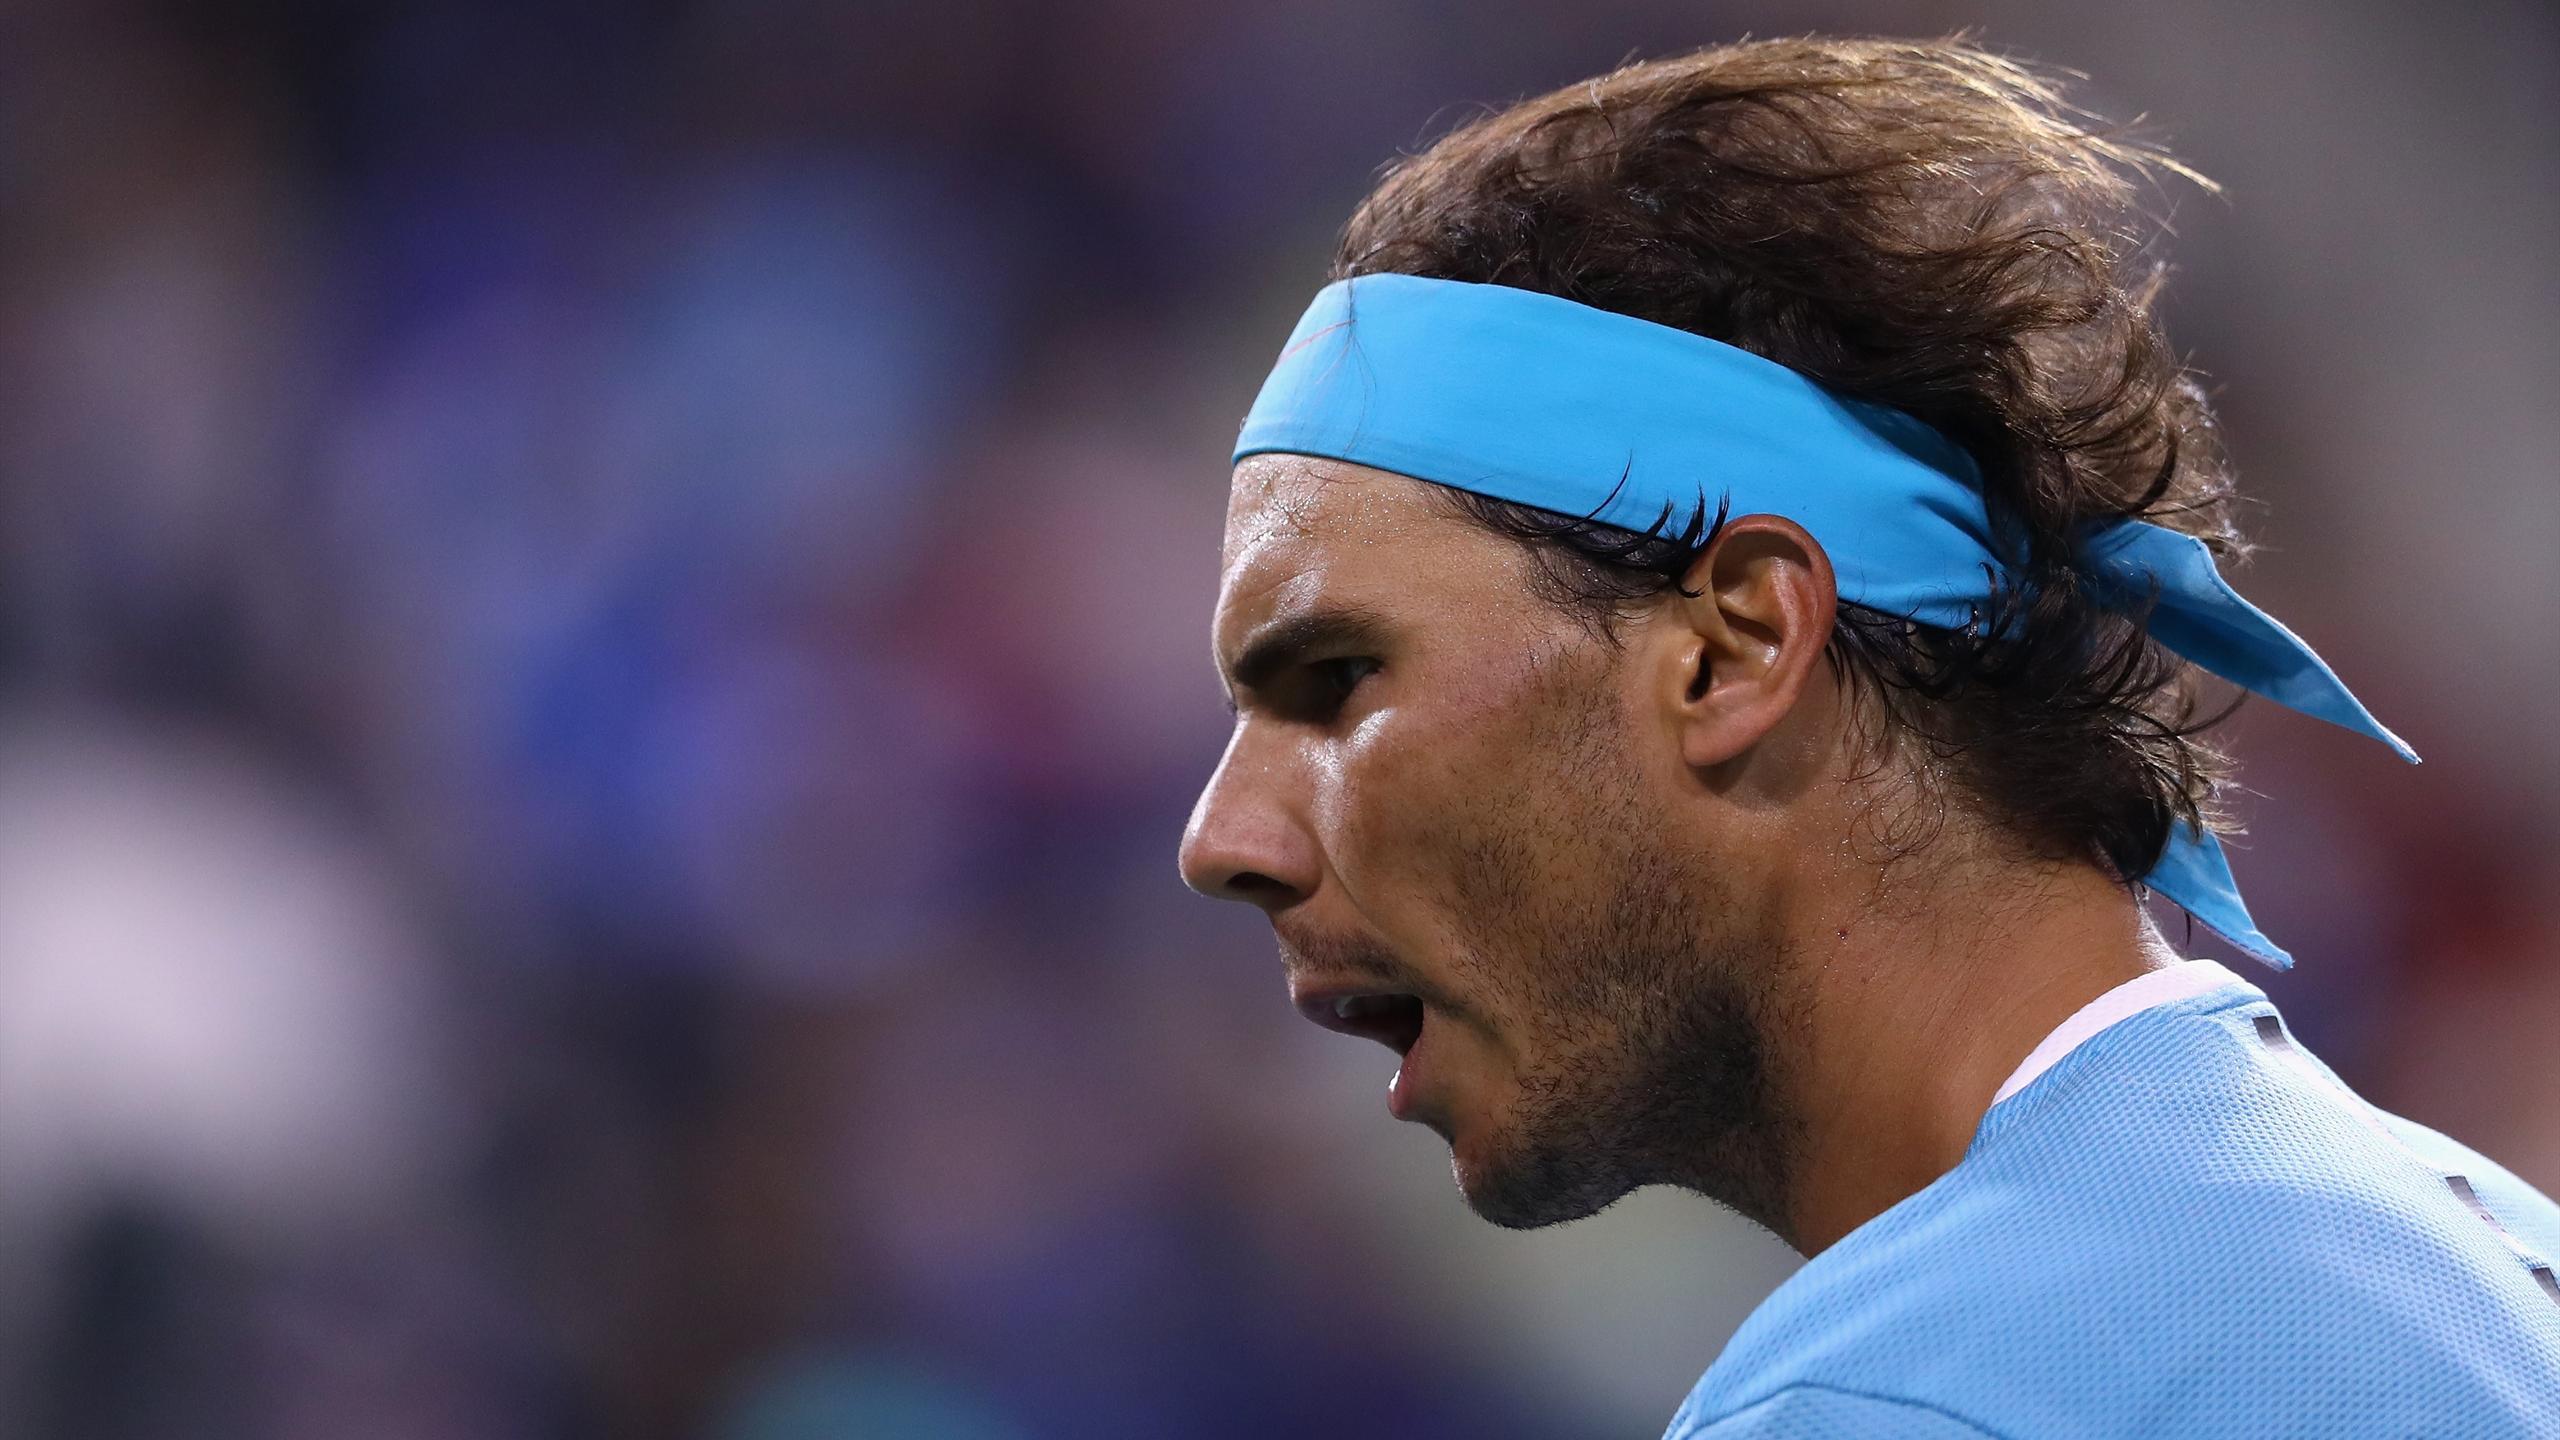 Rafael Nadal lors de son entrée en lice à Indian Wells